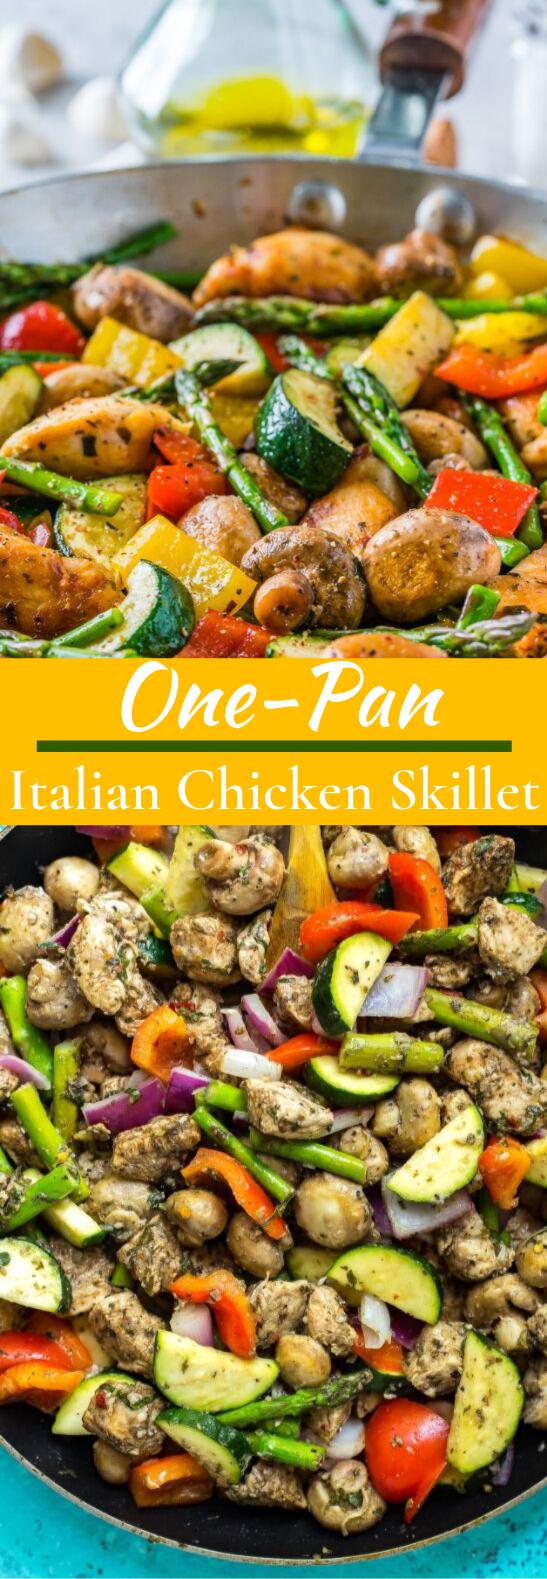 One Pan Italian Chicken Skillet #healthy #glutenfree